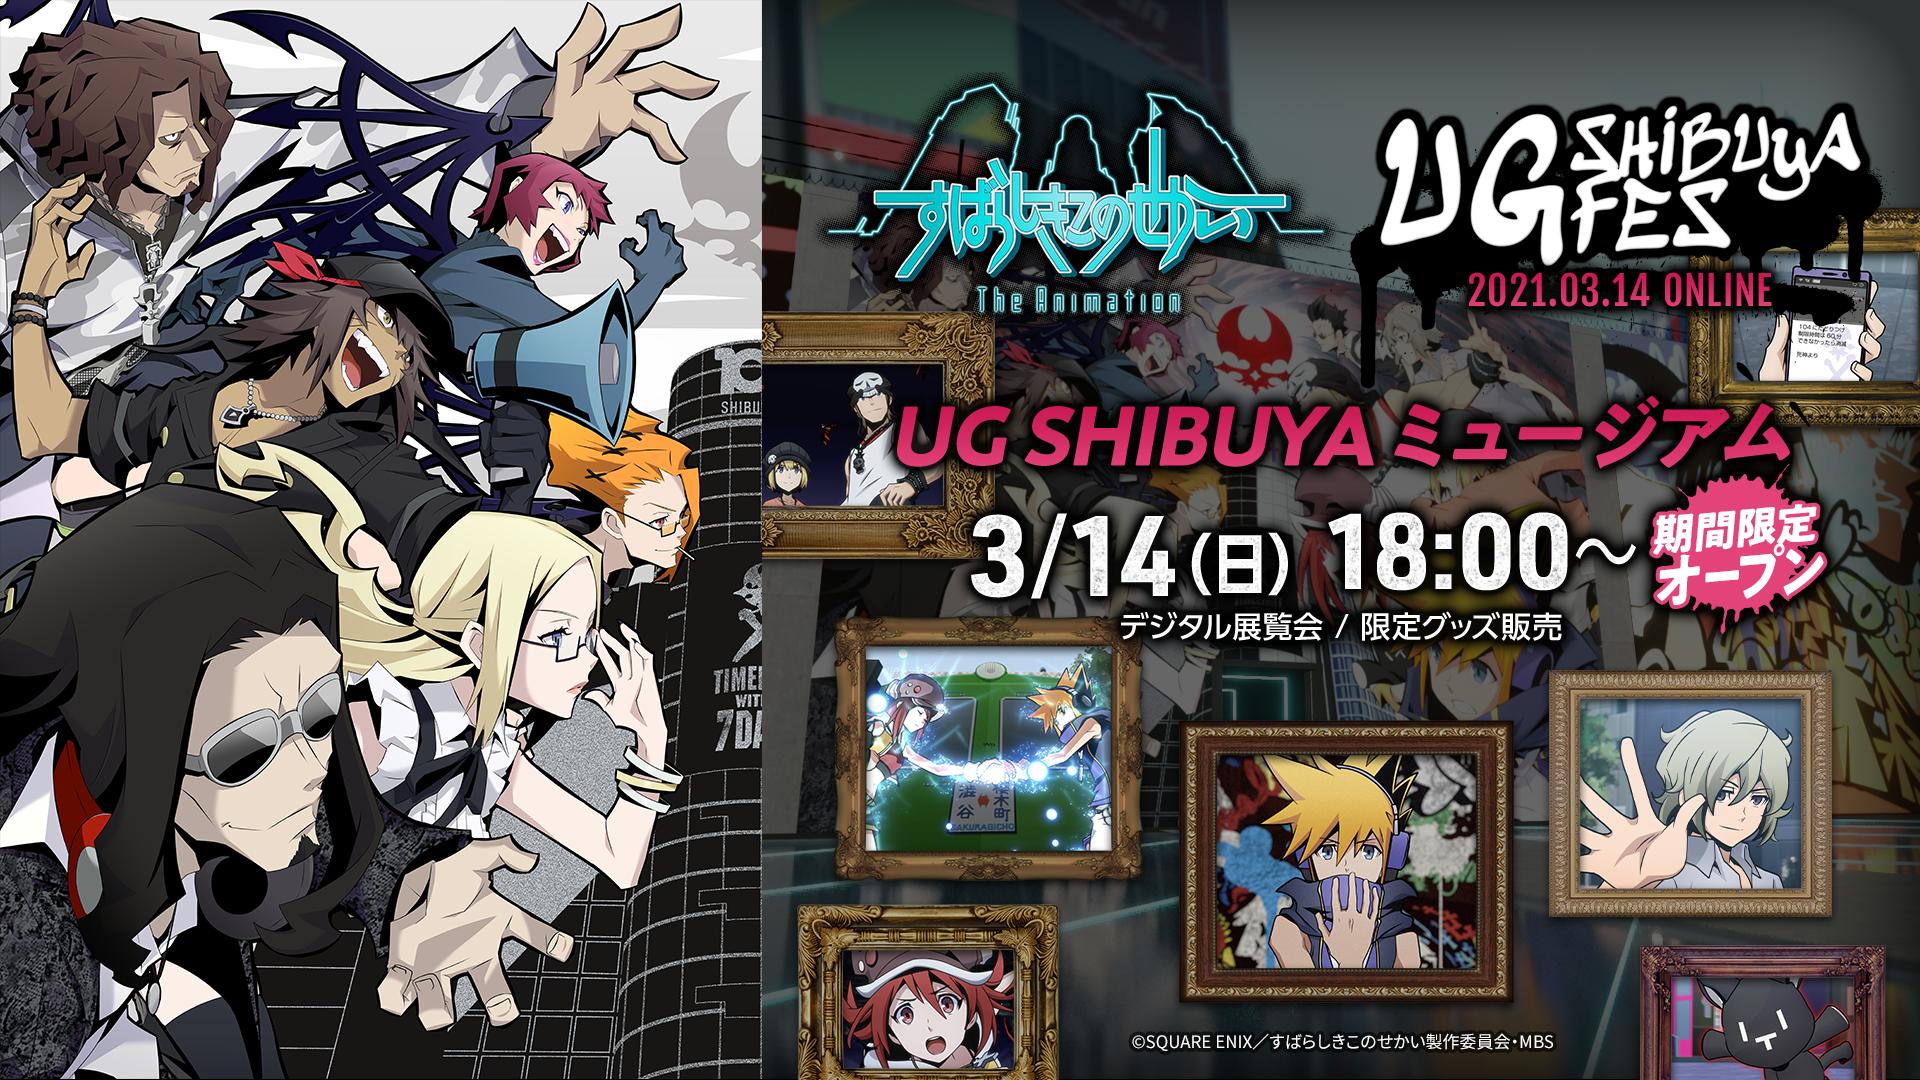 TVアニメ「すばらしきこのせかい The Animation」UG SHIBUYA FES「UG SHIBUYA ミュージアム」